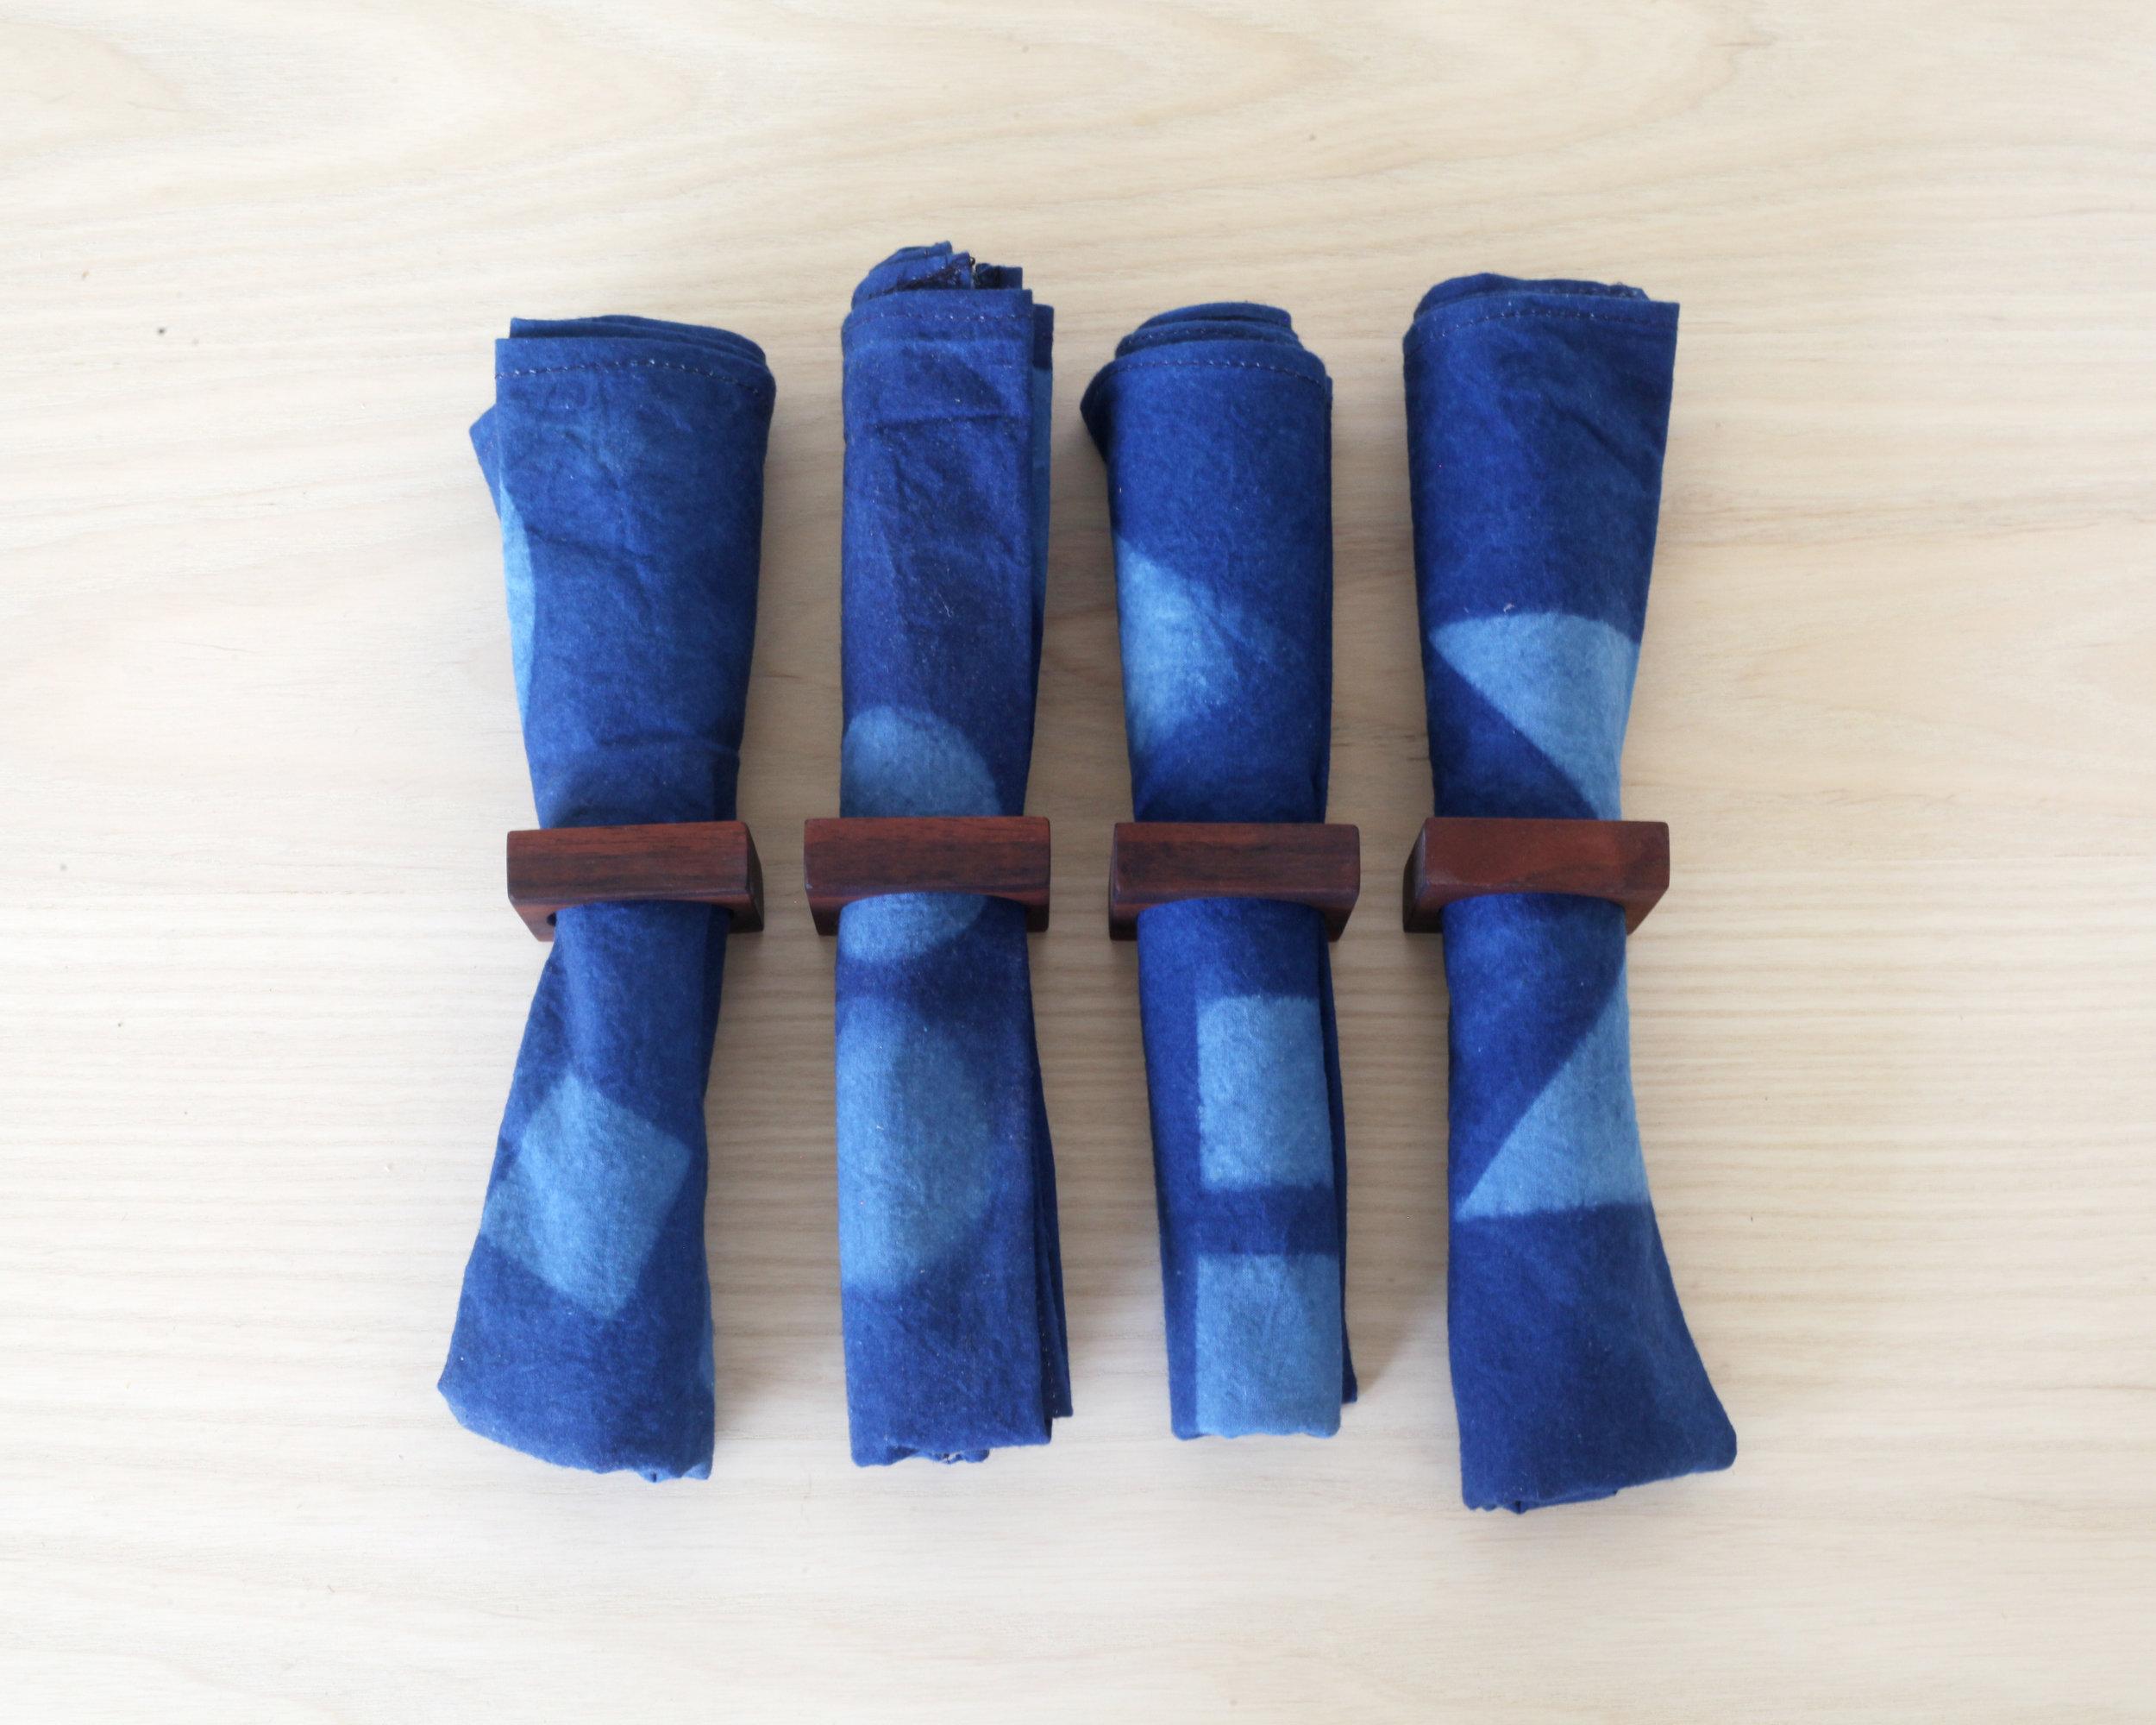 Napkin rings- Claro walnut  Indigo napkins by Emily Gui